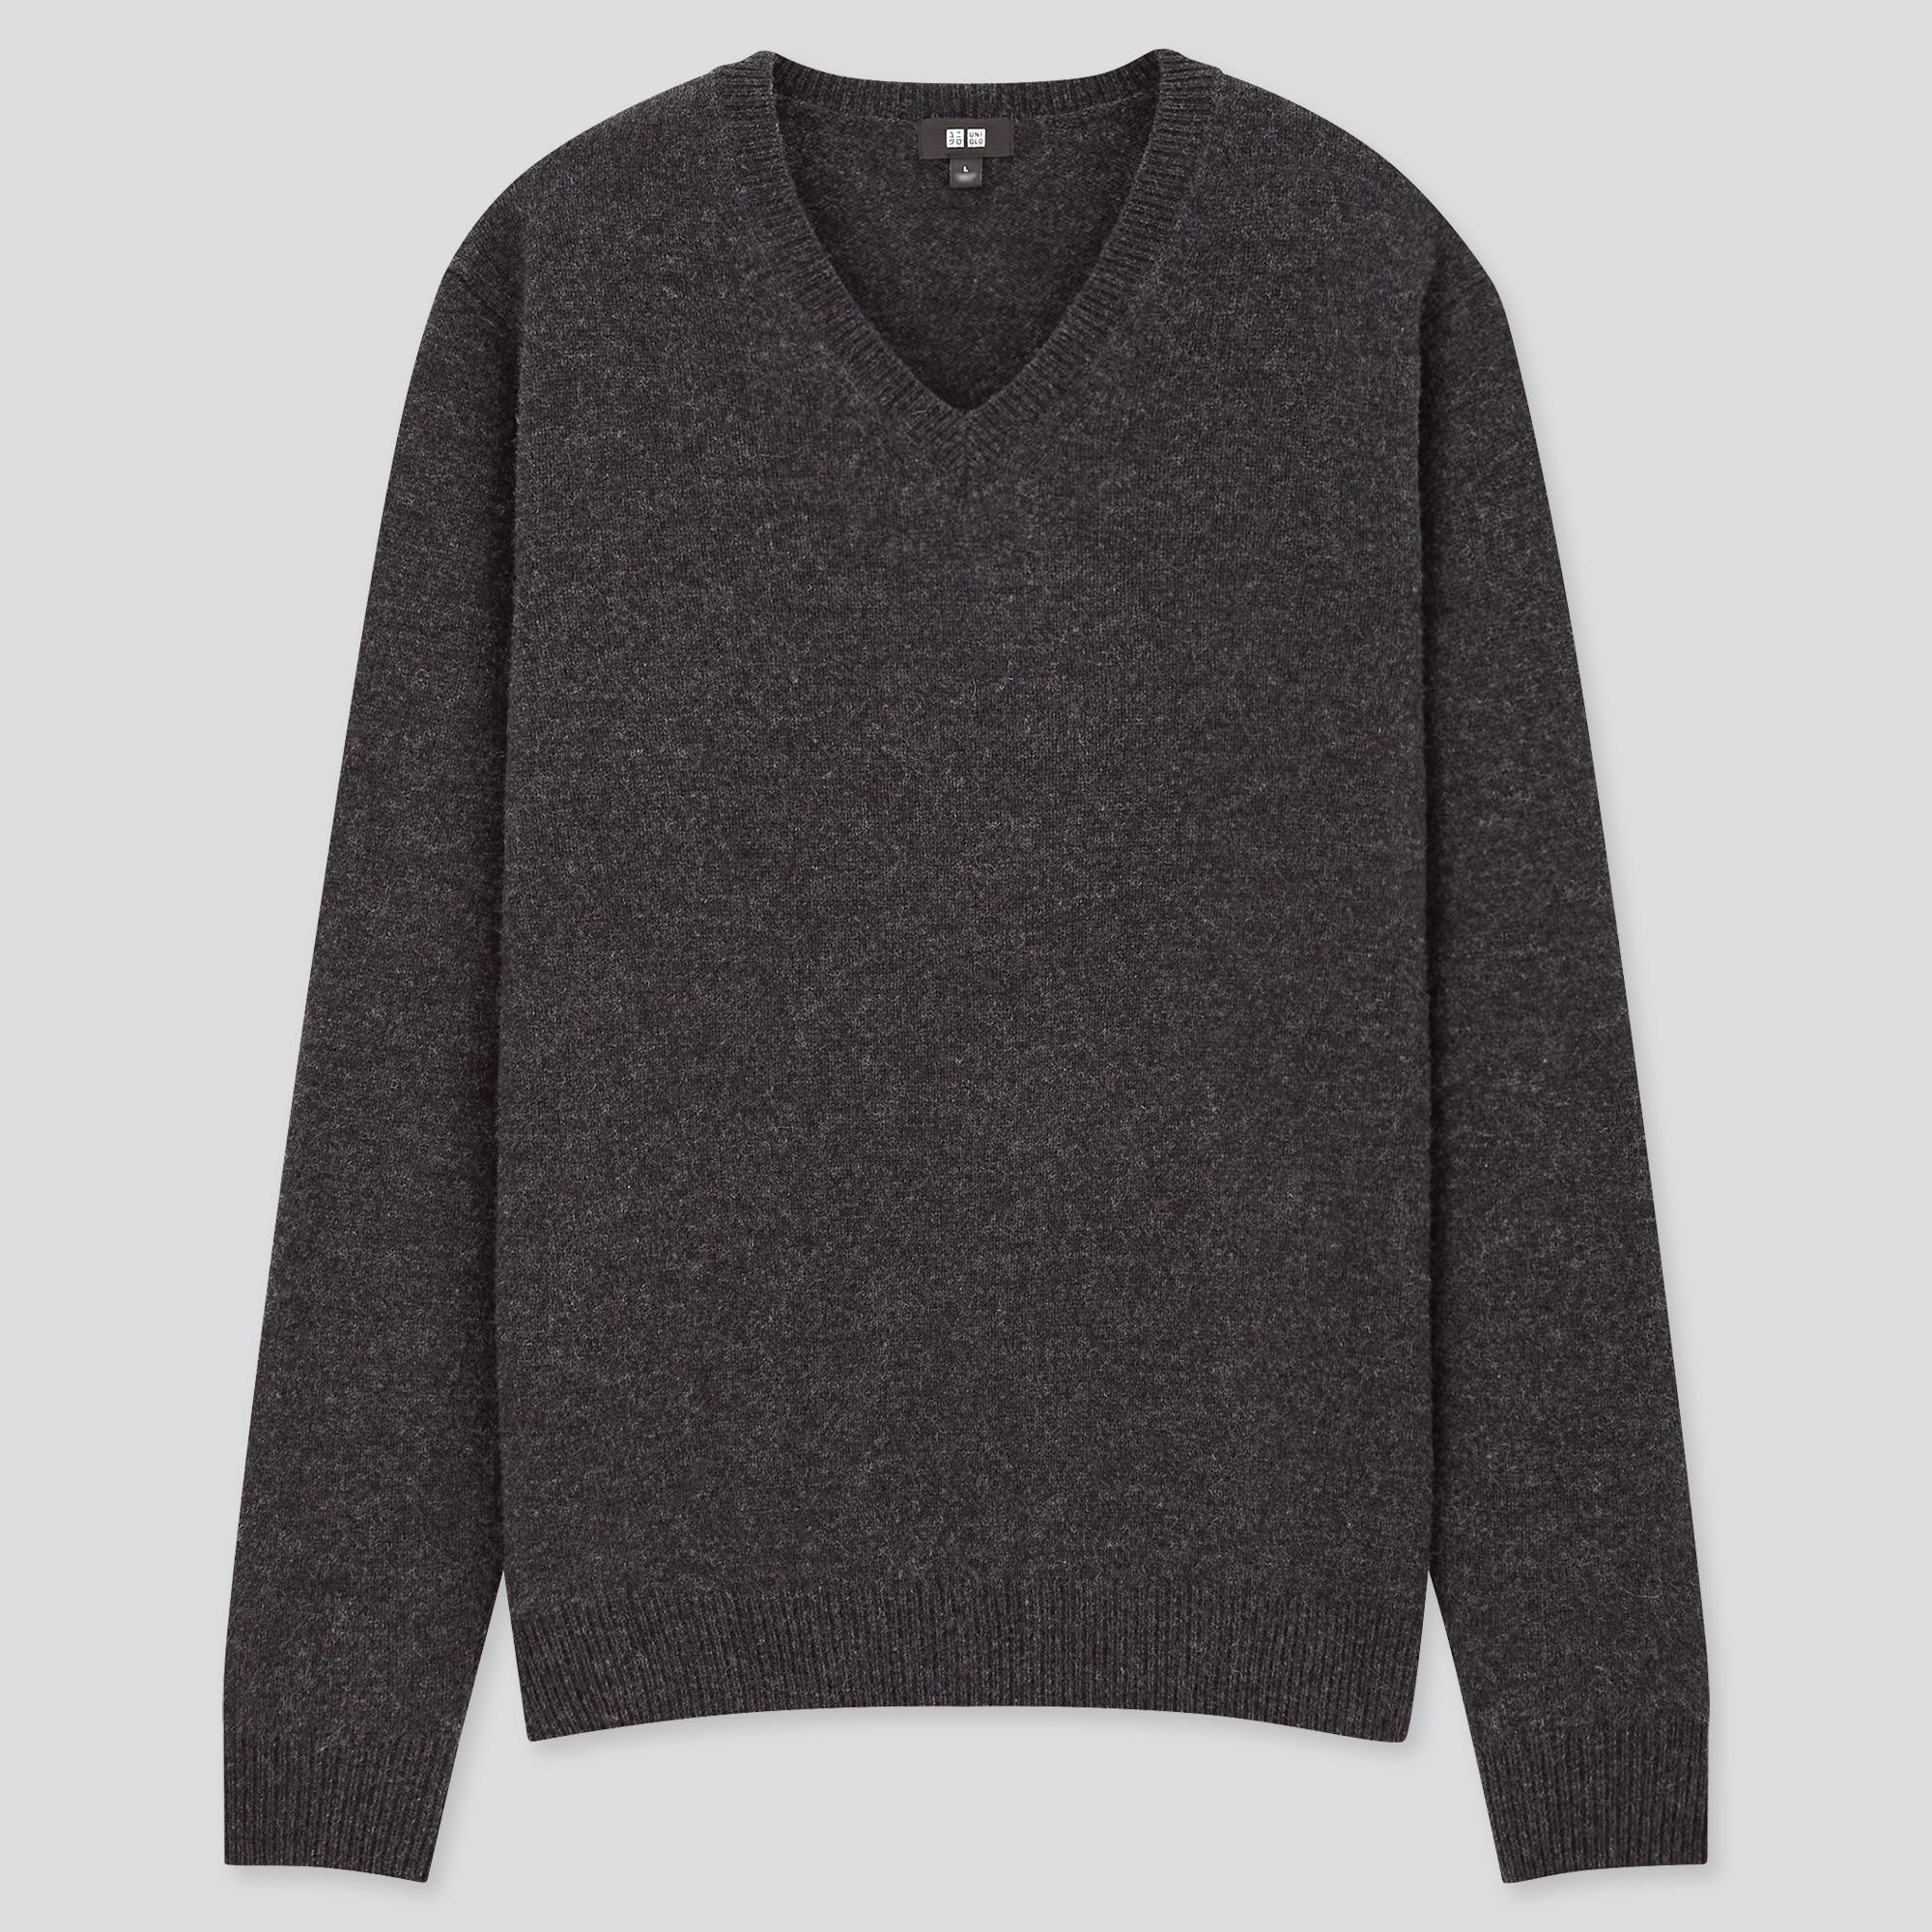 Soon Maternity Womens Waist Length Bell Sleeve Sweater Light Gray Size XS